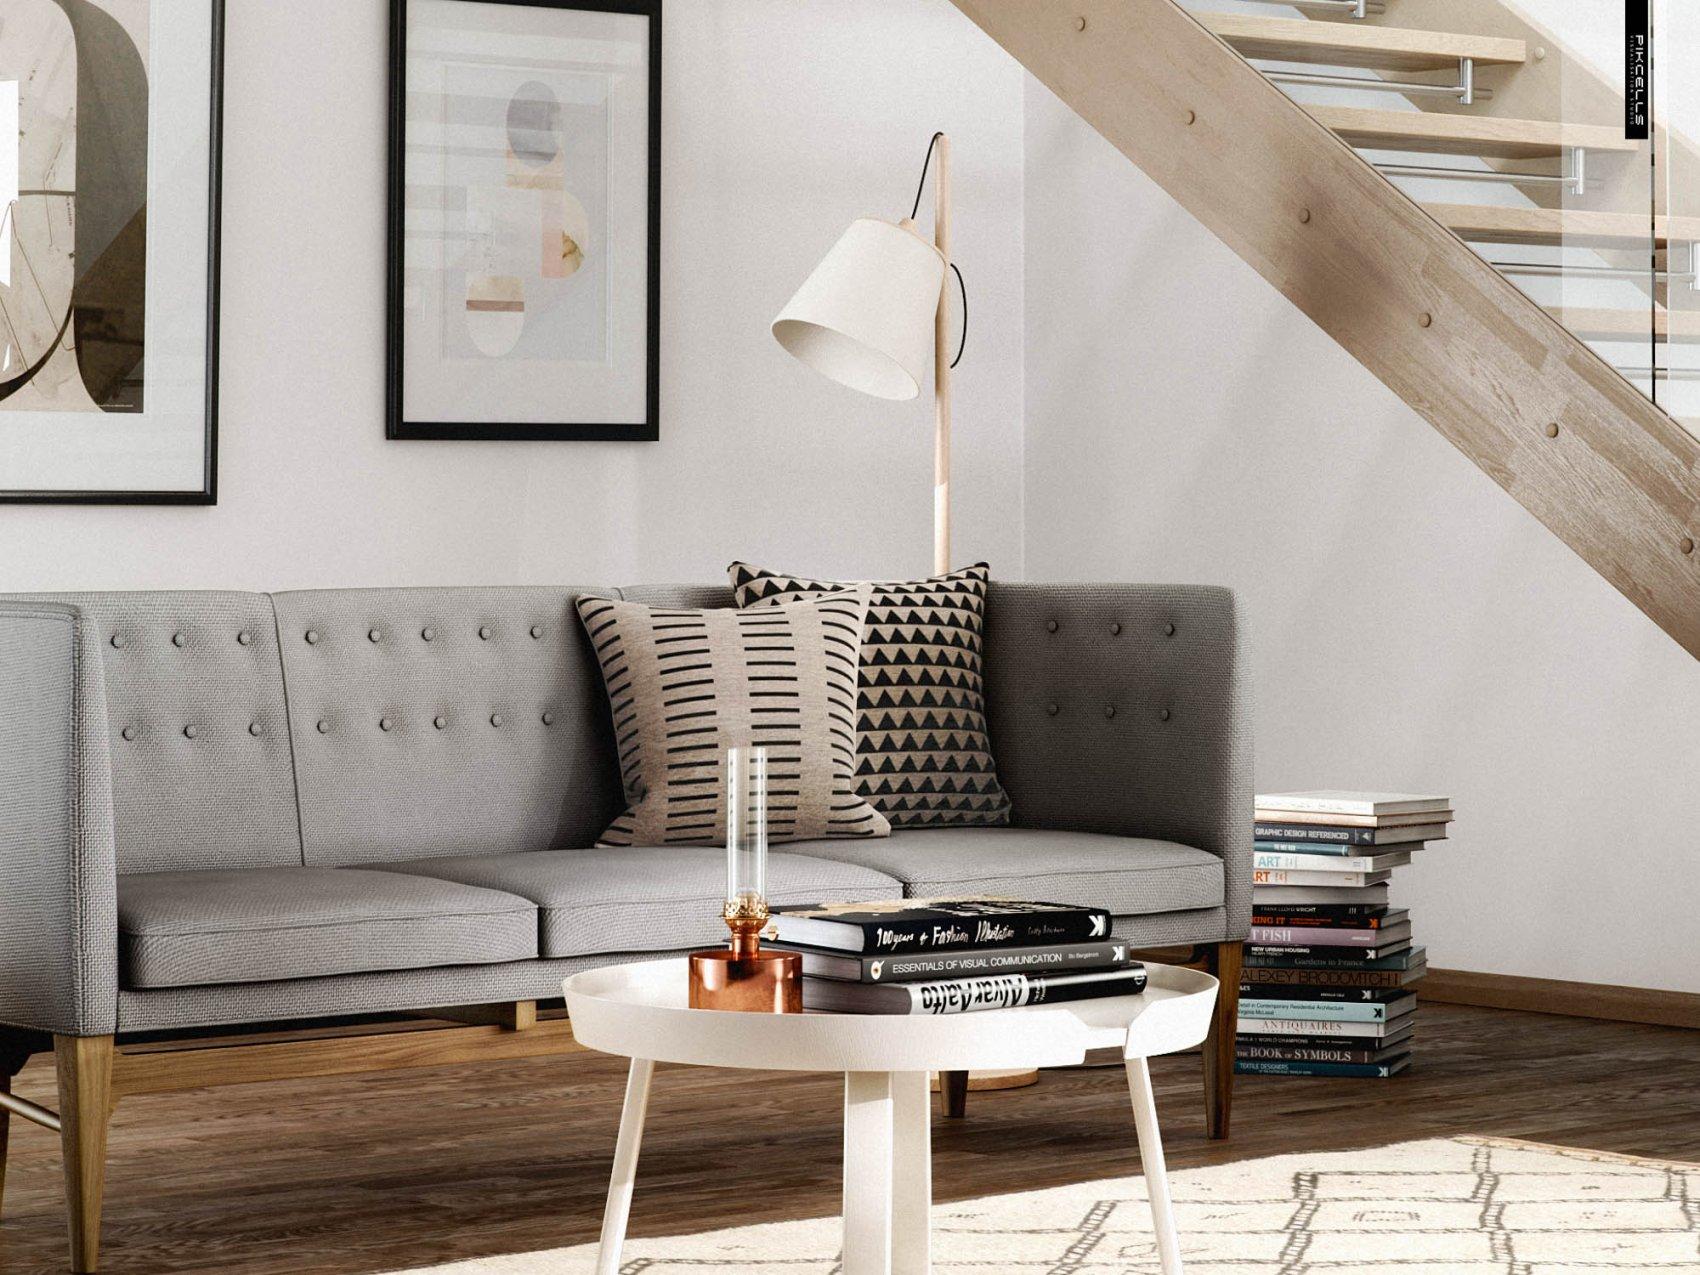 Stunning Full Size of Furniture:modern Furniture Near Me Mid Century Modern Chaise affordable scandinavian furniture